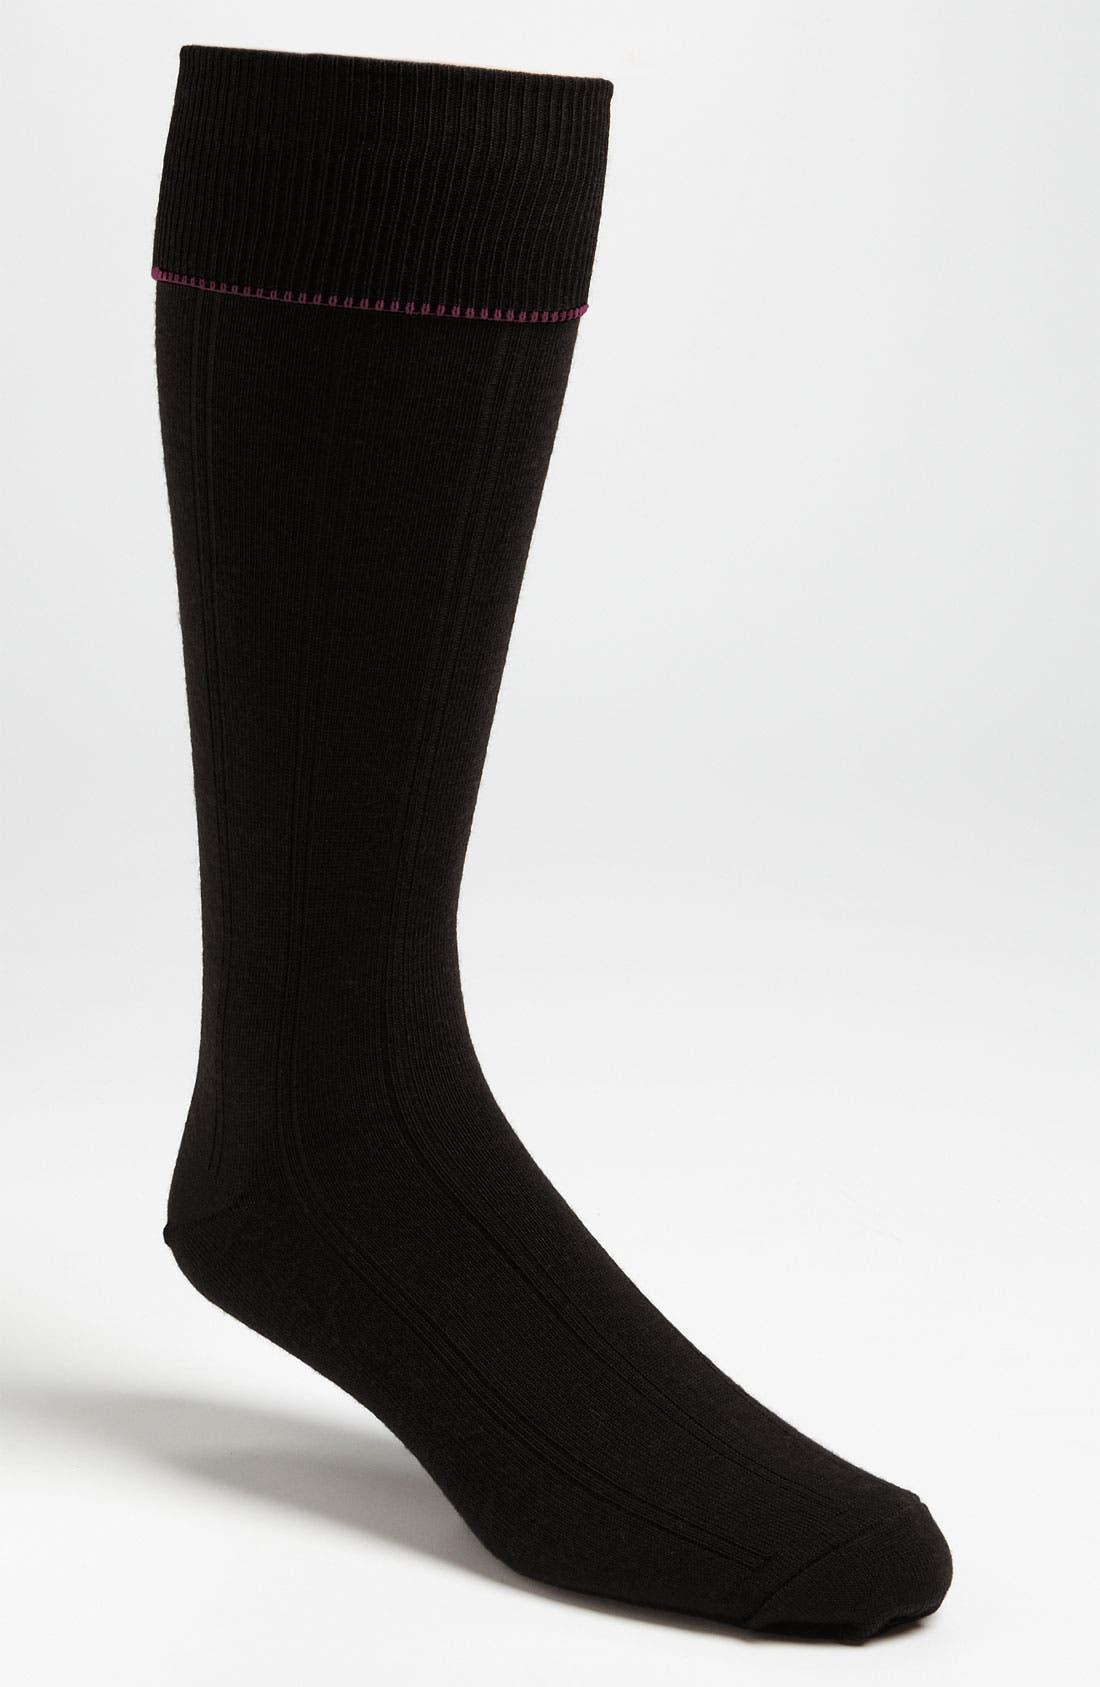 Nordstrom Mens Shop Over the Calf Wool Socks,                             Main thumbnail 1, color,                             BLACK